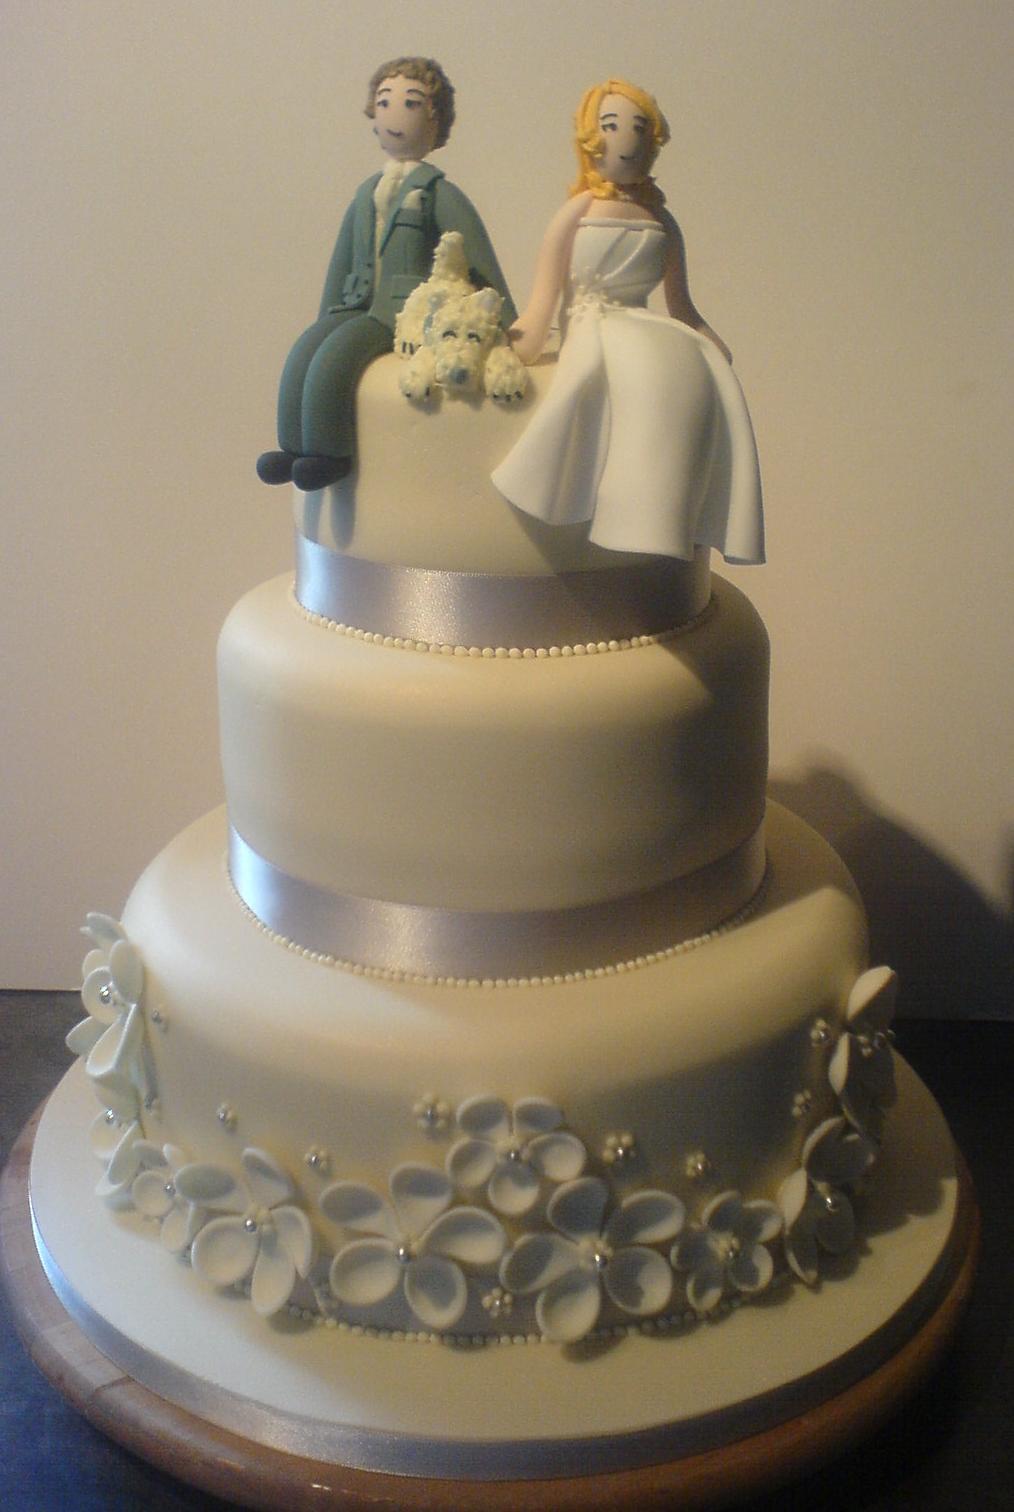 cozzmic cakes three tier wedding cake custom bride groom. Black Bedroom Furniture Sets. Home Design Ideas